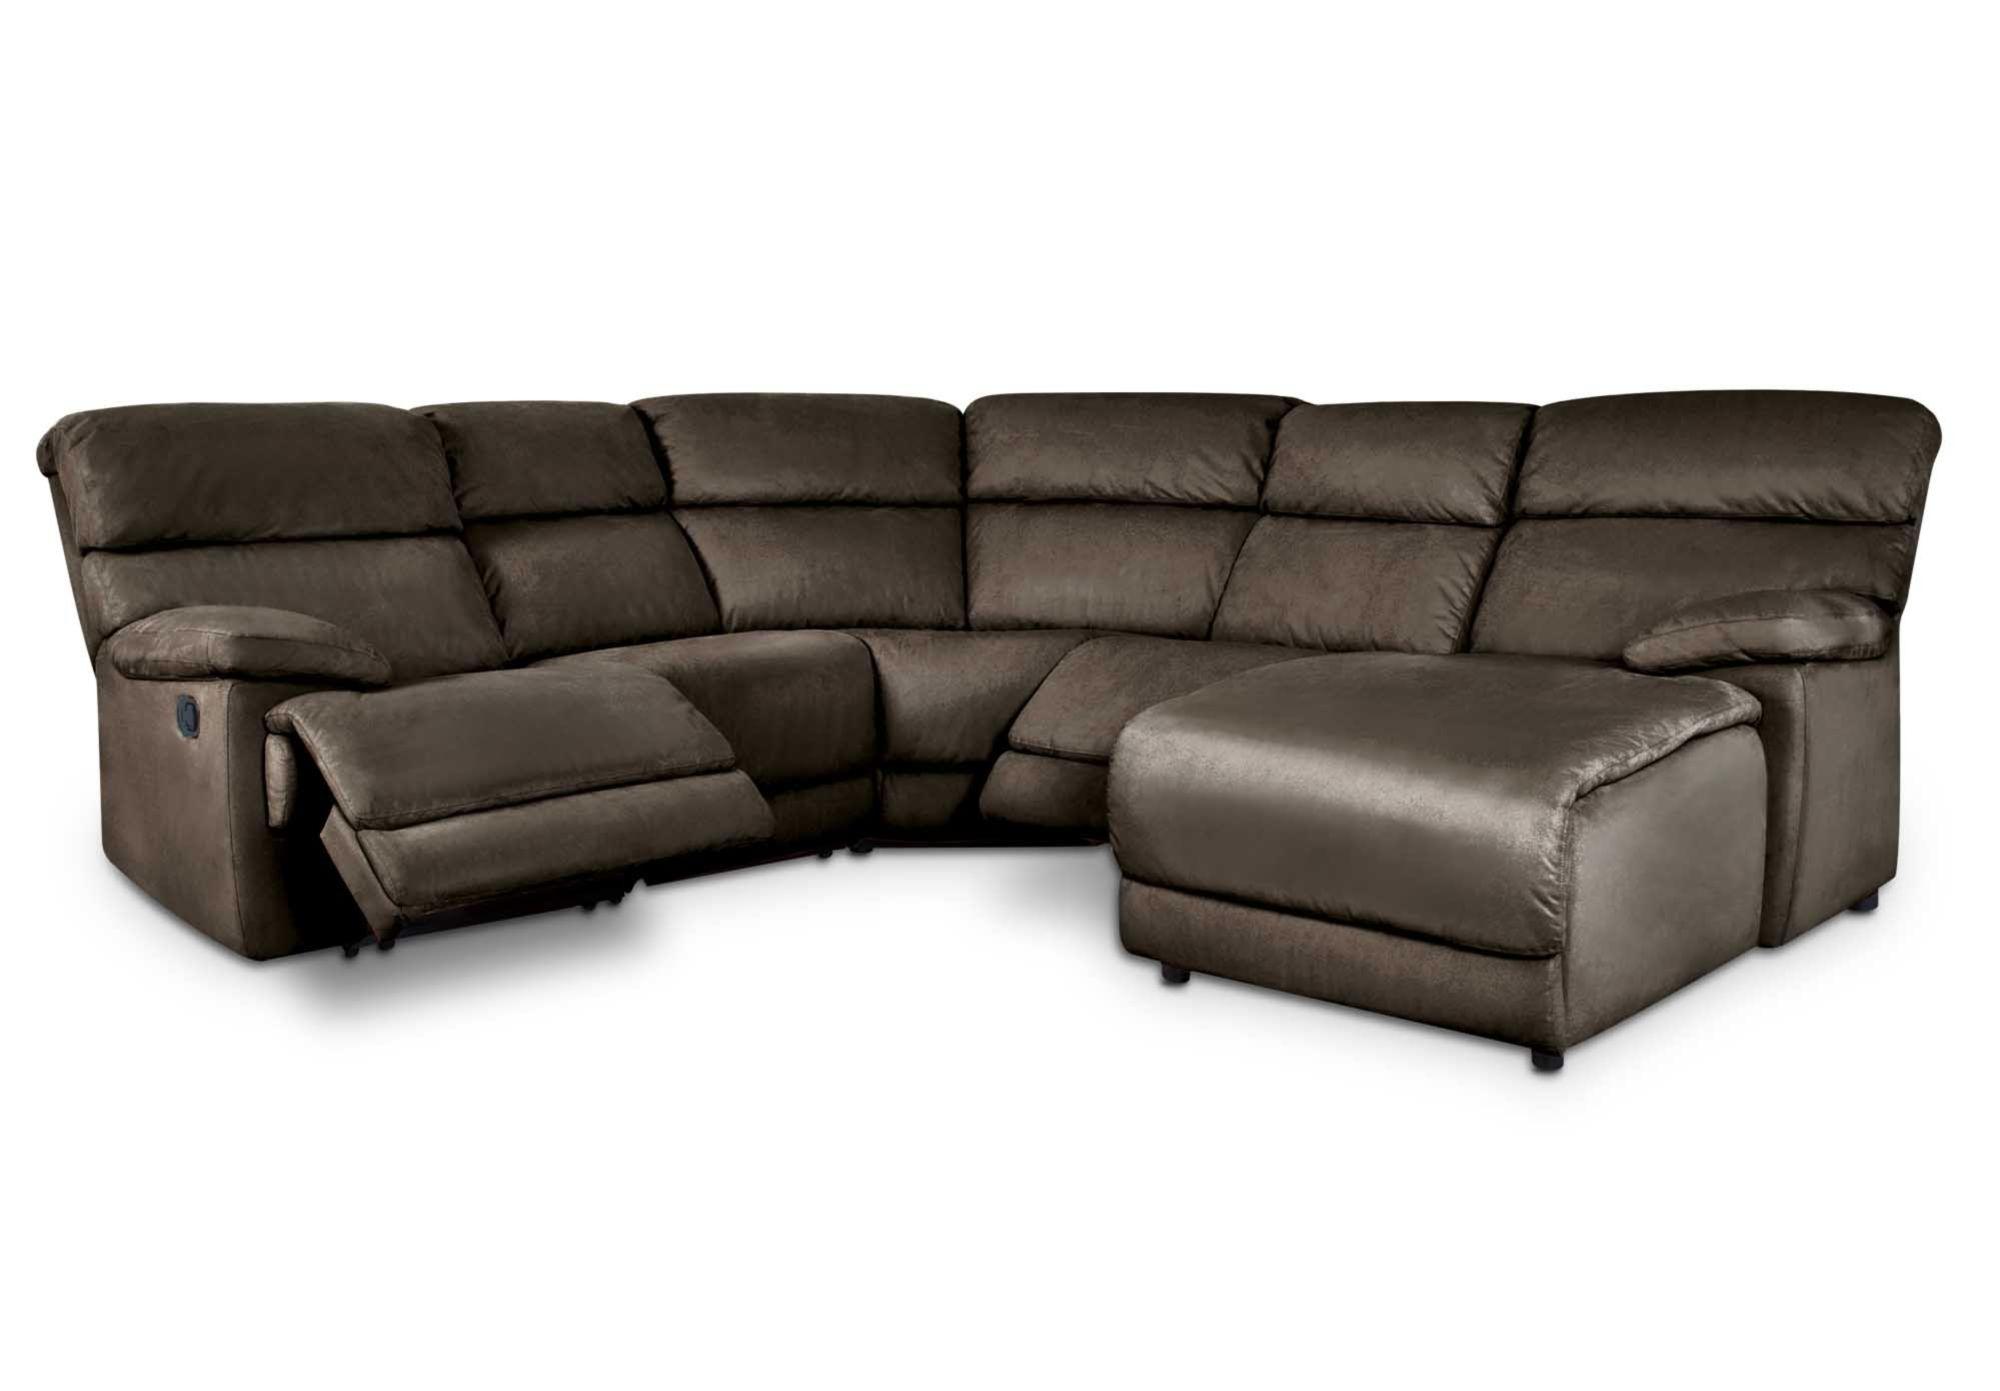 Furniture Village Sofas rhf corner sofa - cupola - gorgeous living room furniture from